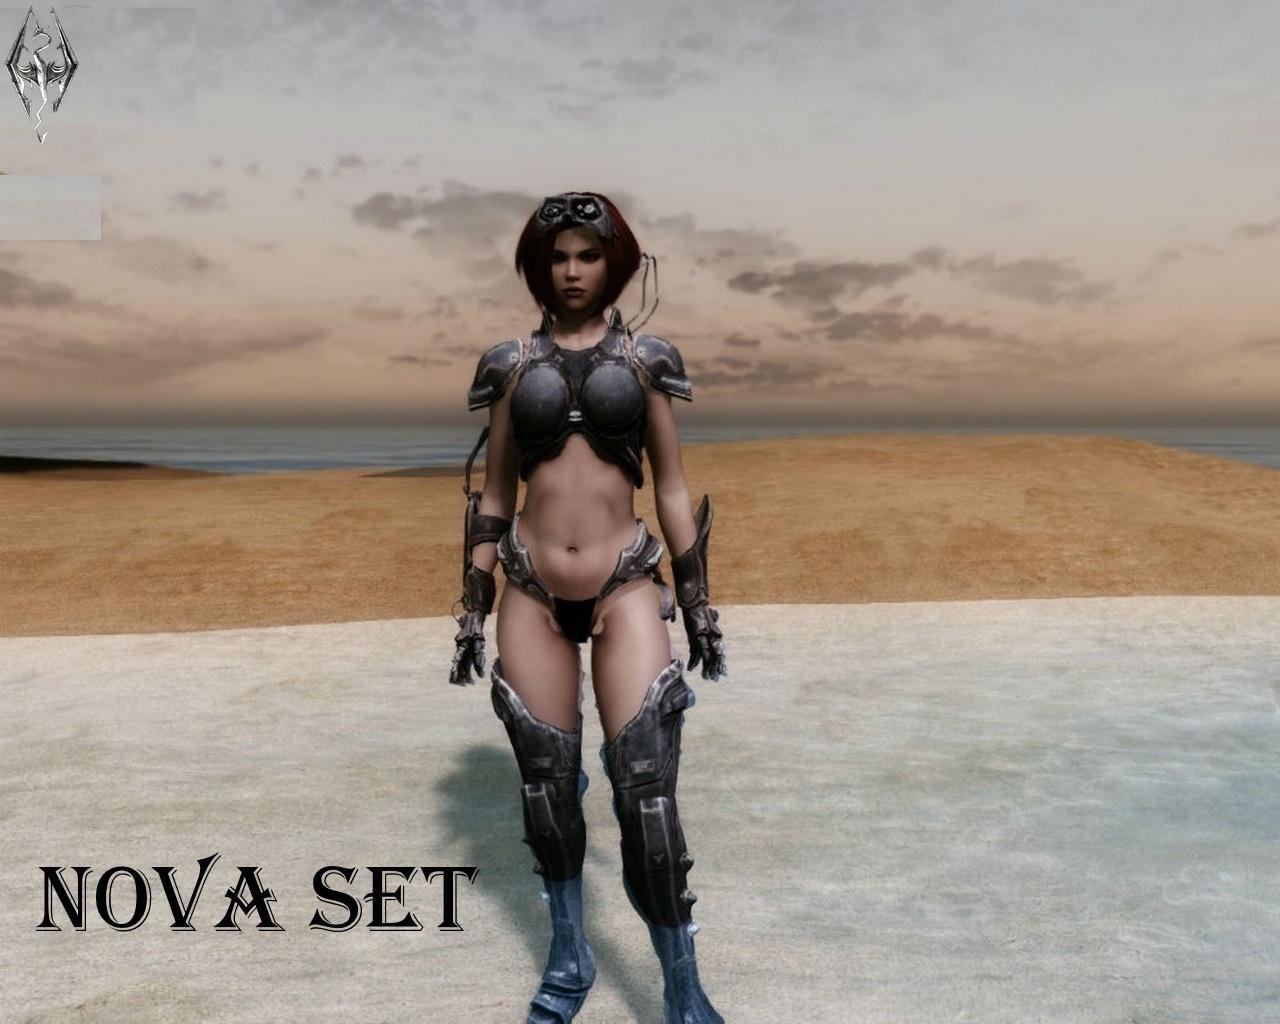 Nova_Set.jpg